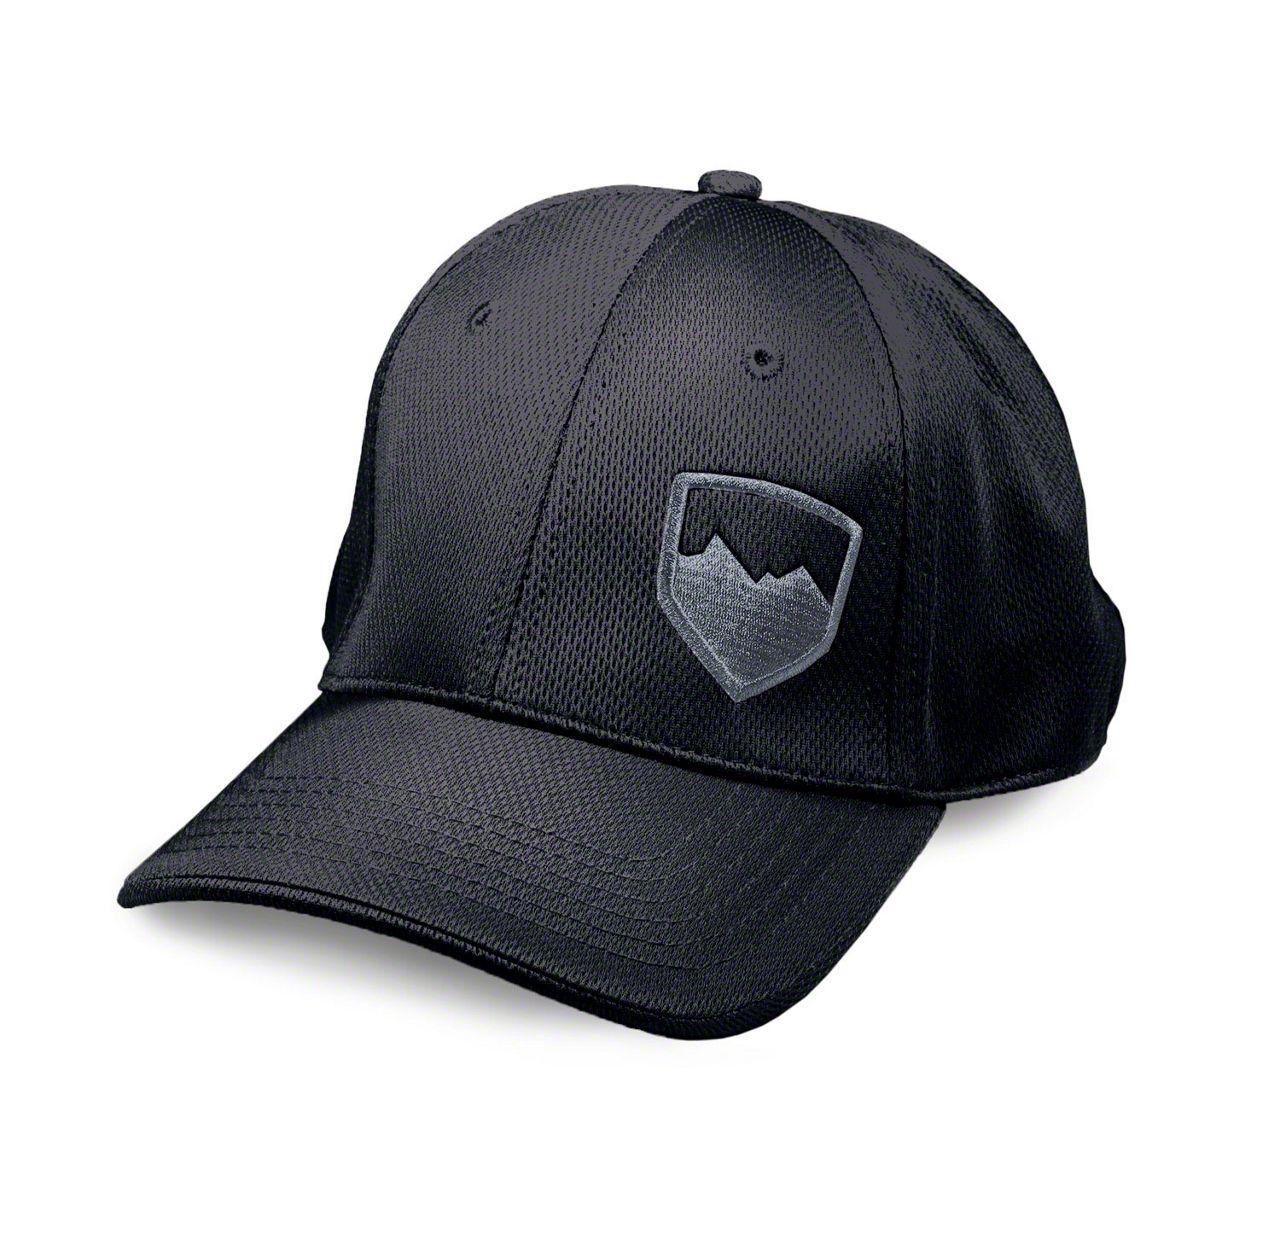 Teraflex Pro Style Stretch Hat - Black